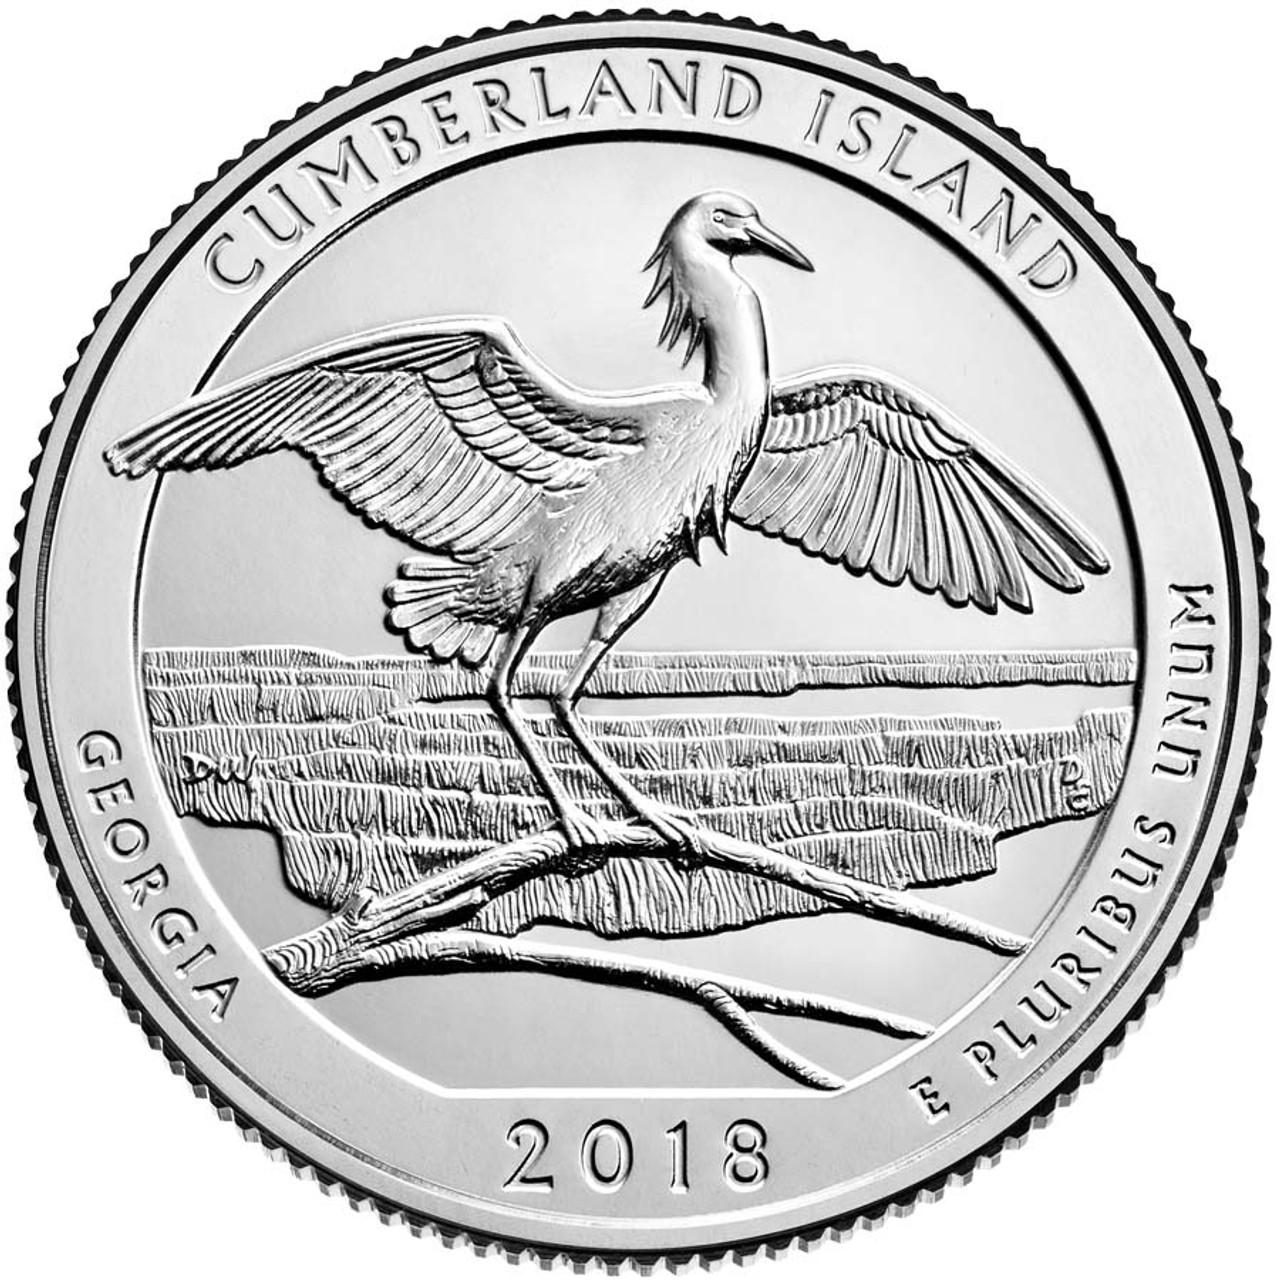 2018-P Cumberland Island National Seashore Quarter Brilliant Uncirculated Image 1